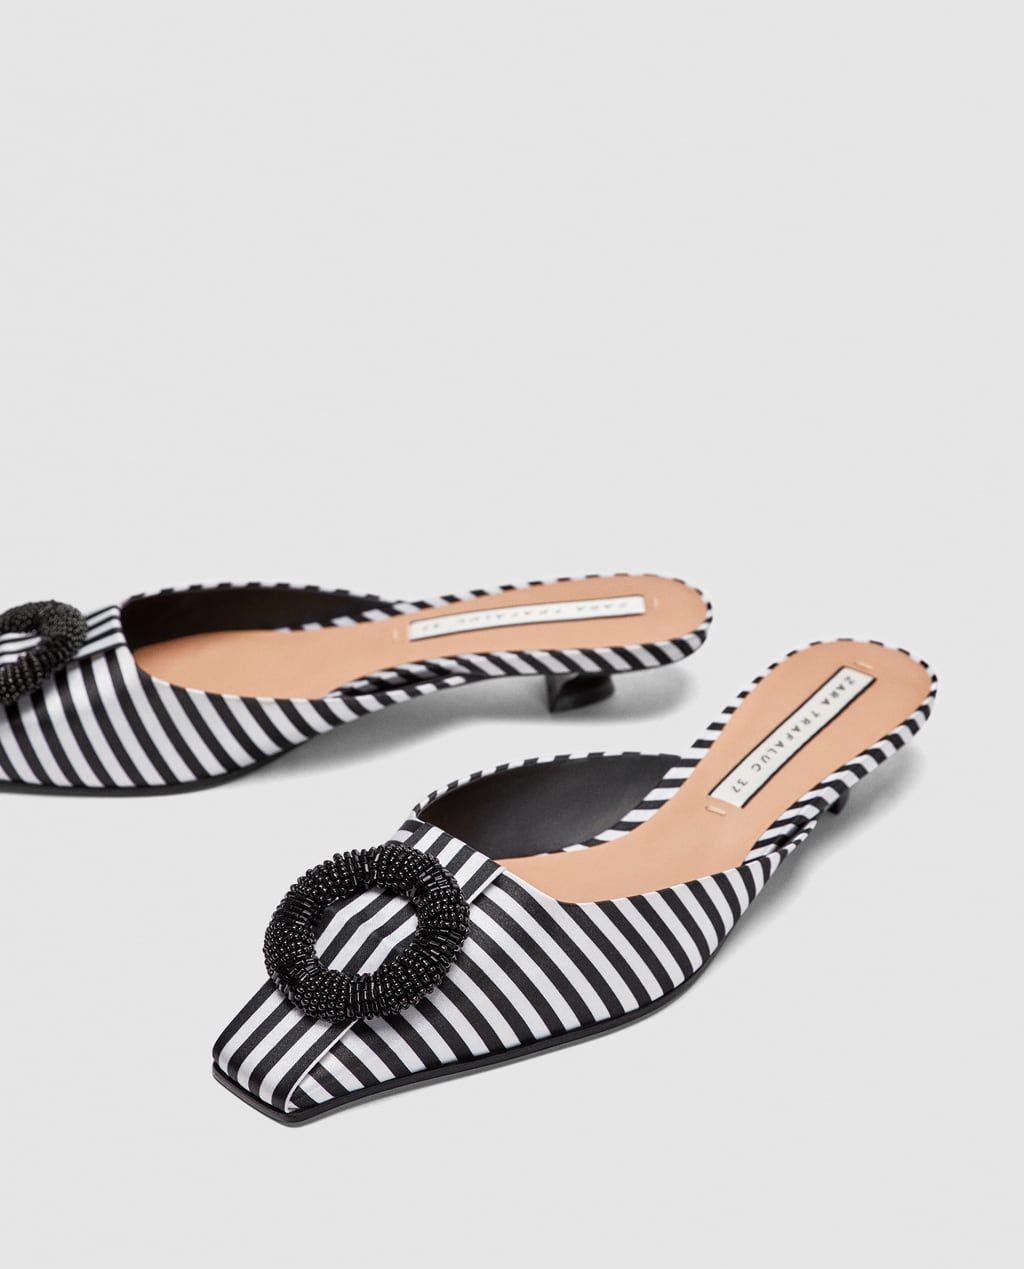 6eb49e75a25 Zapatos de mujer y calzado